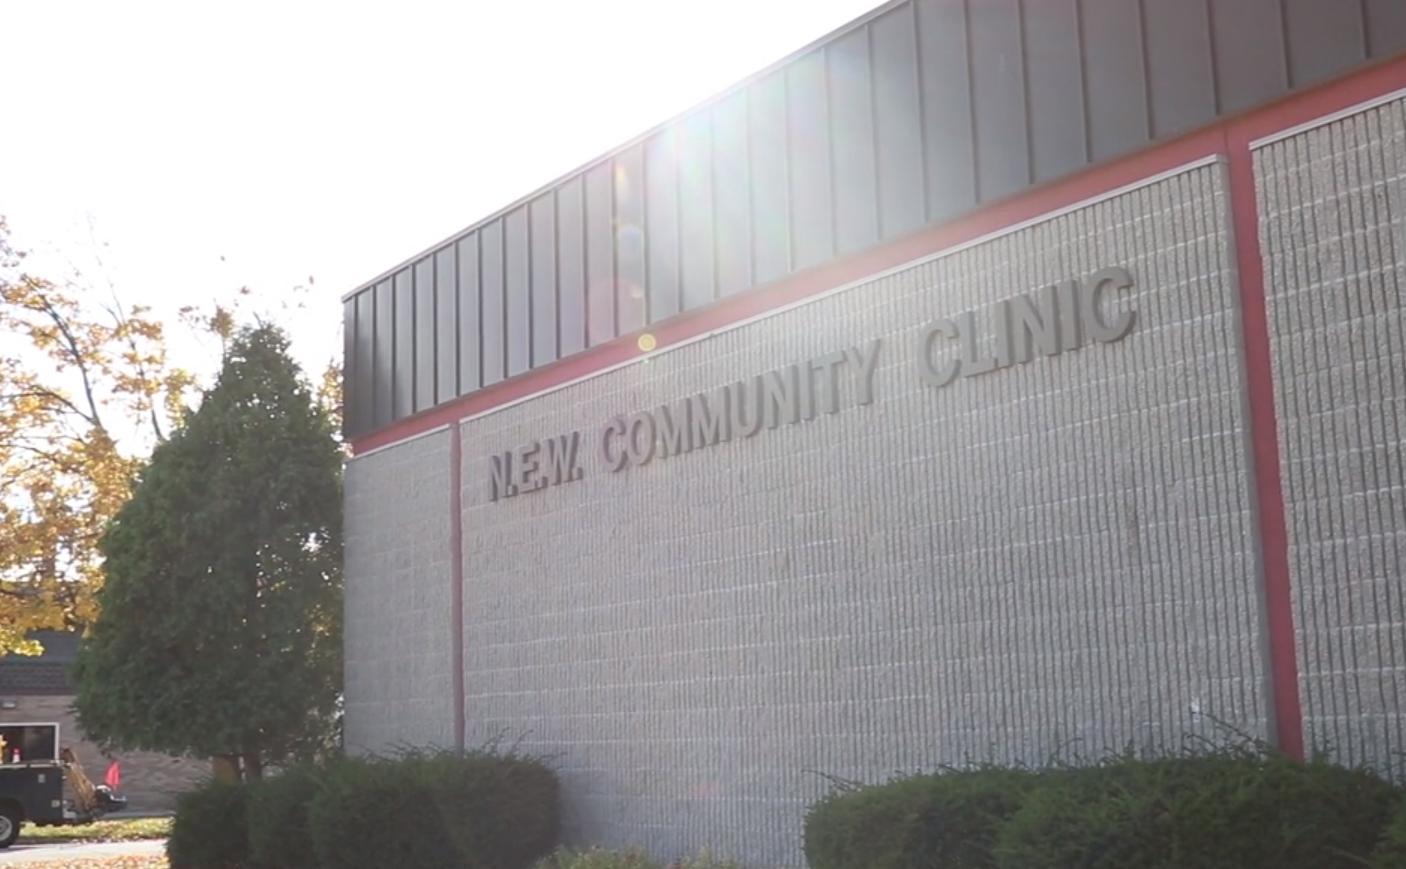 NEW Community Clinic